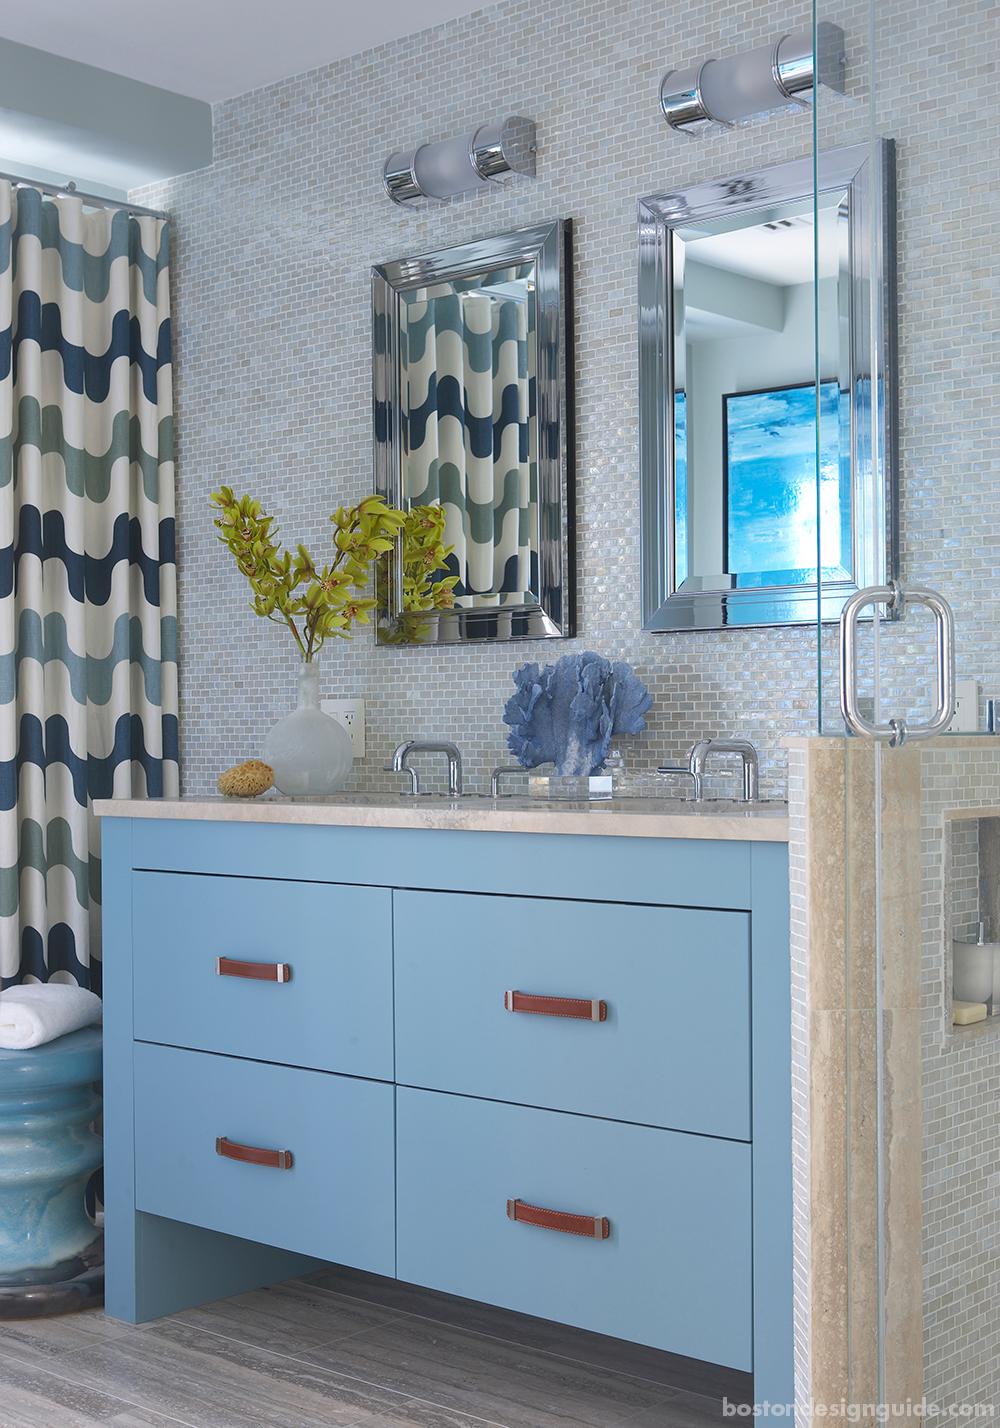 high-end bathroom design trends